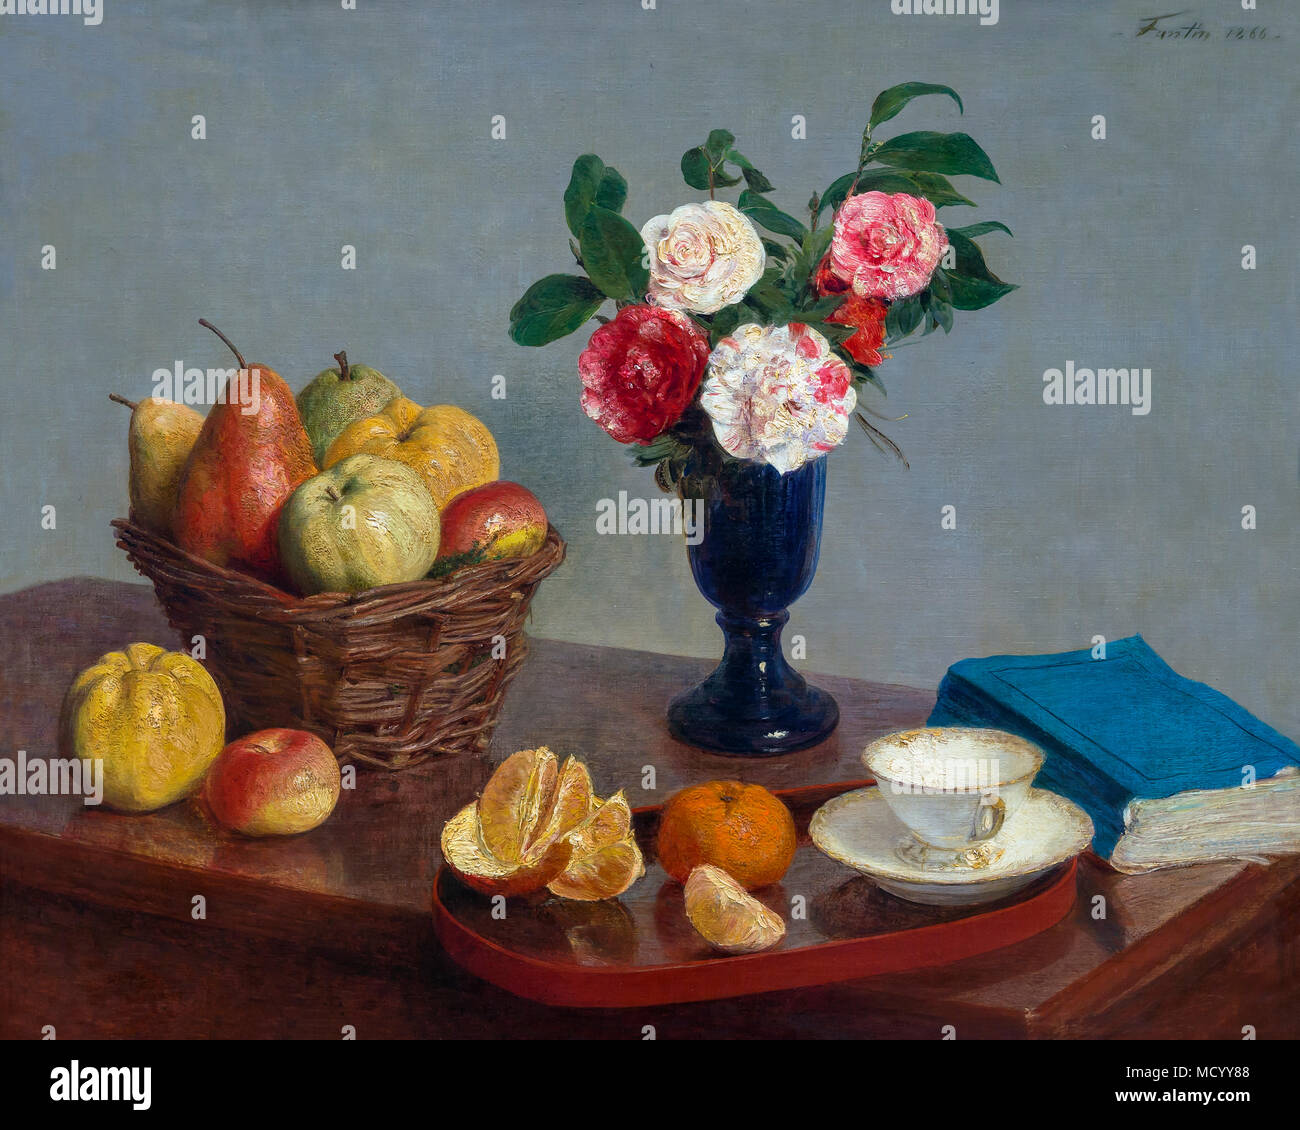 Still Life, Henri Fantin-Latour, 1866, National Gallery of Art, Washington DC, USA, Amérique du Nord Photo Stock